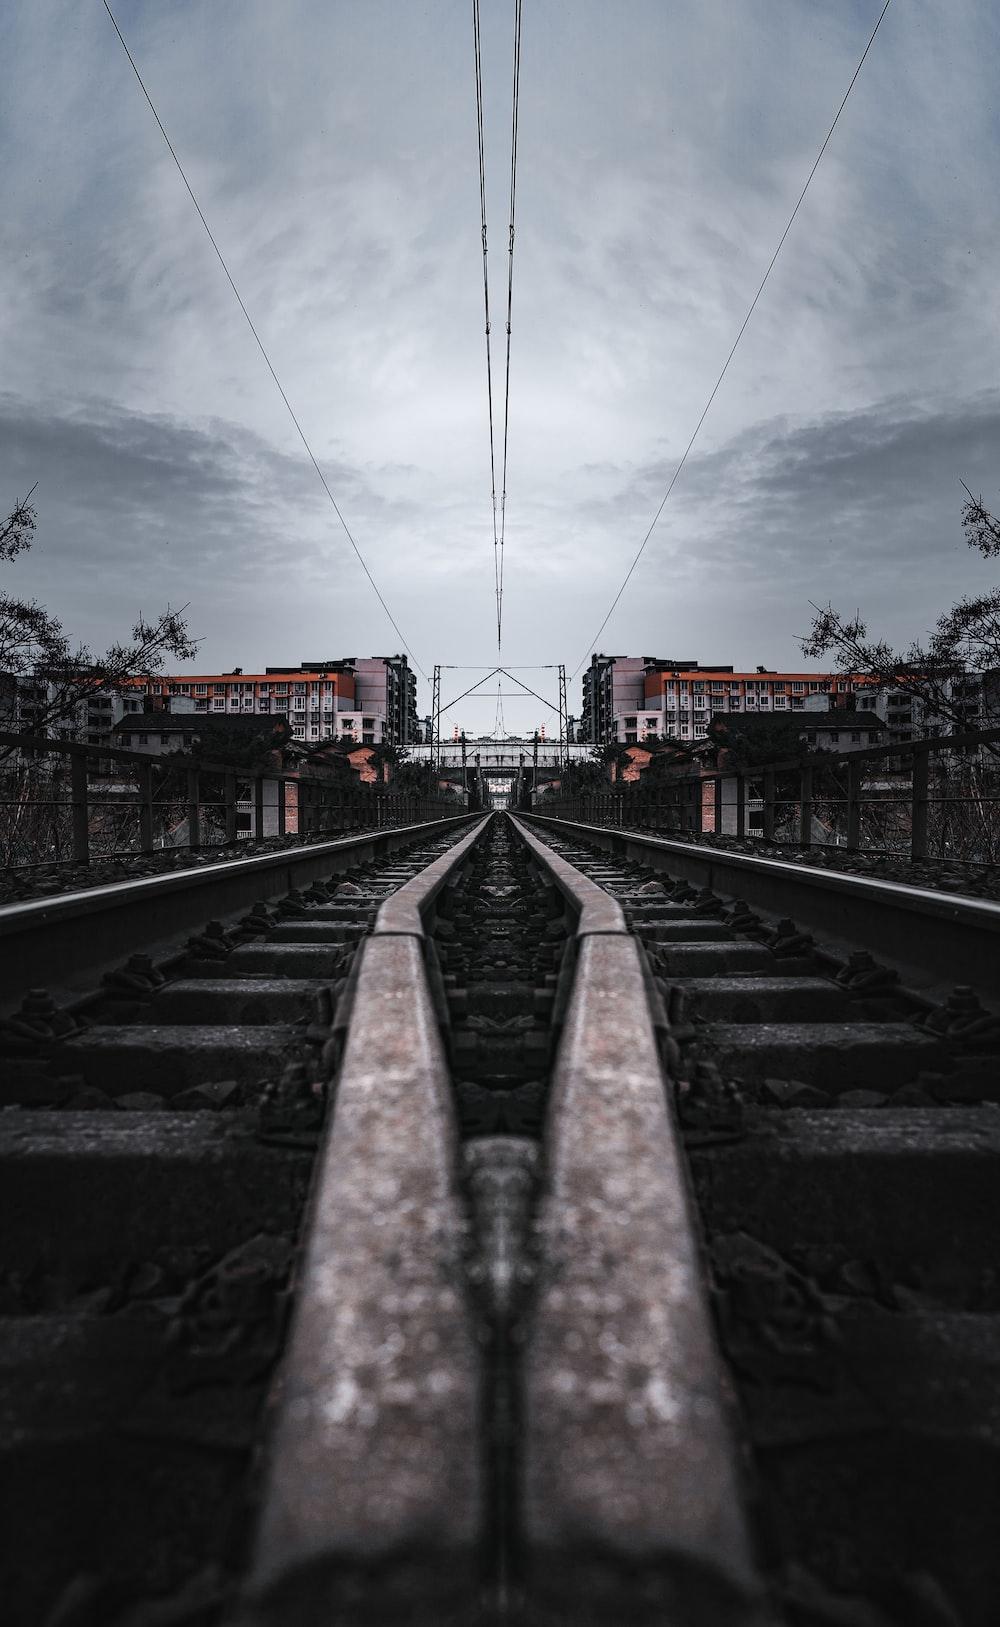 train rail under cloudy sky